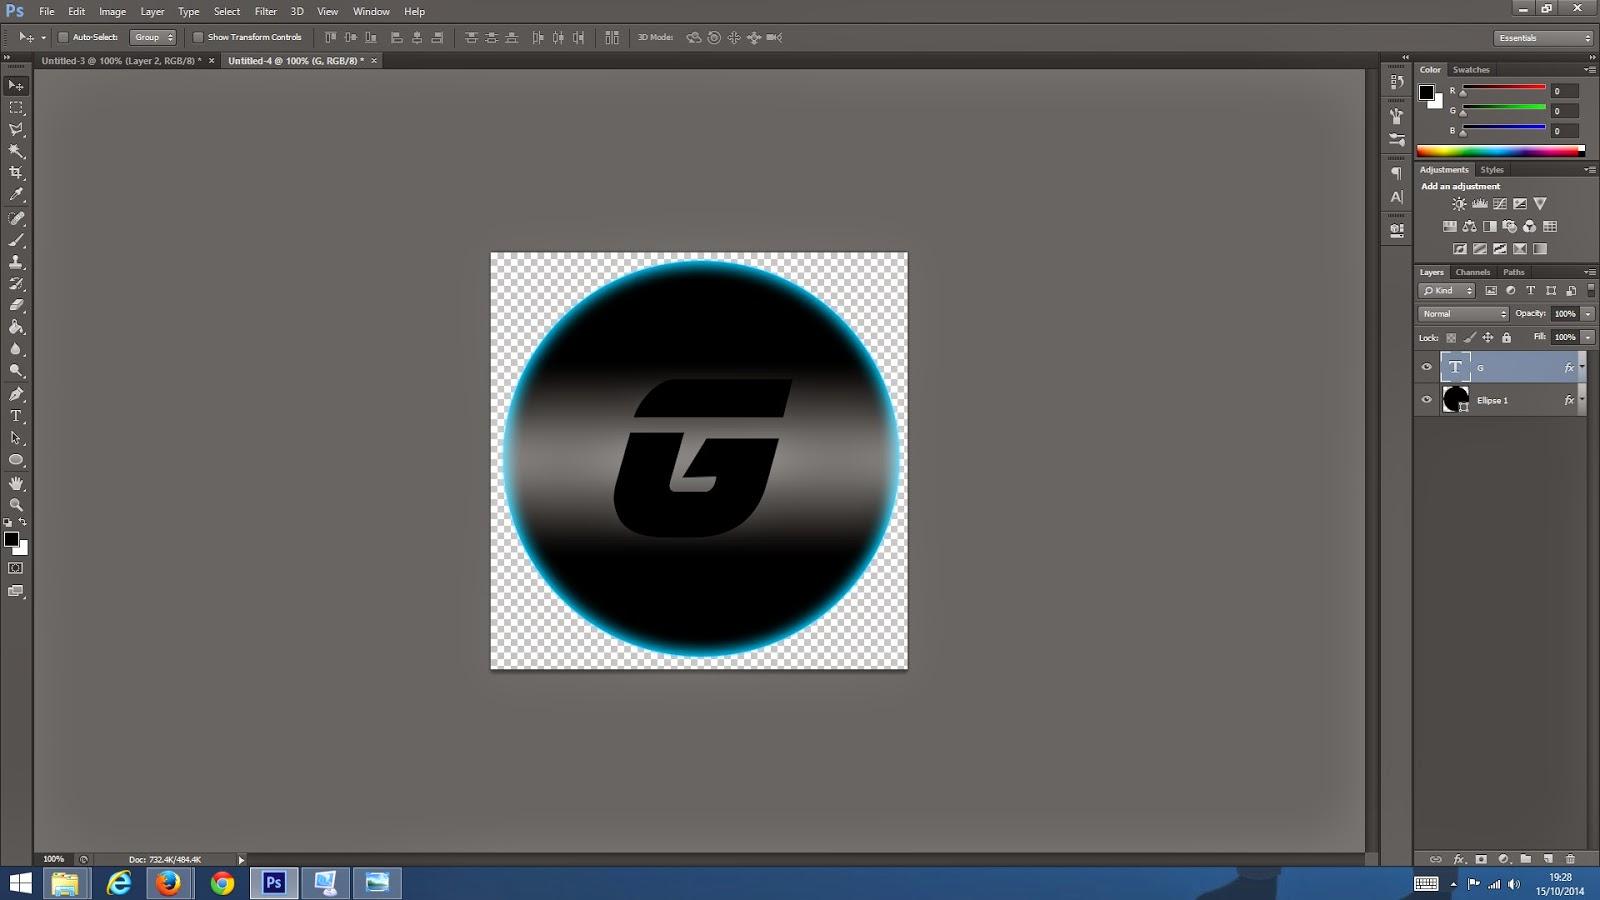 cara membuat logo cara membuat logo dengan photoshop cs6